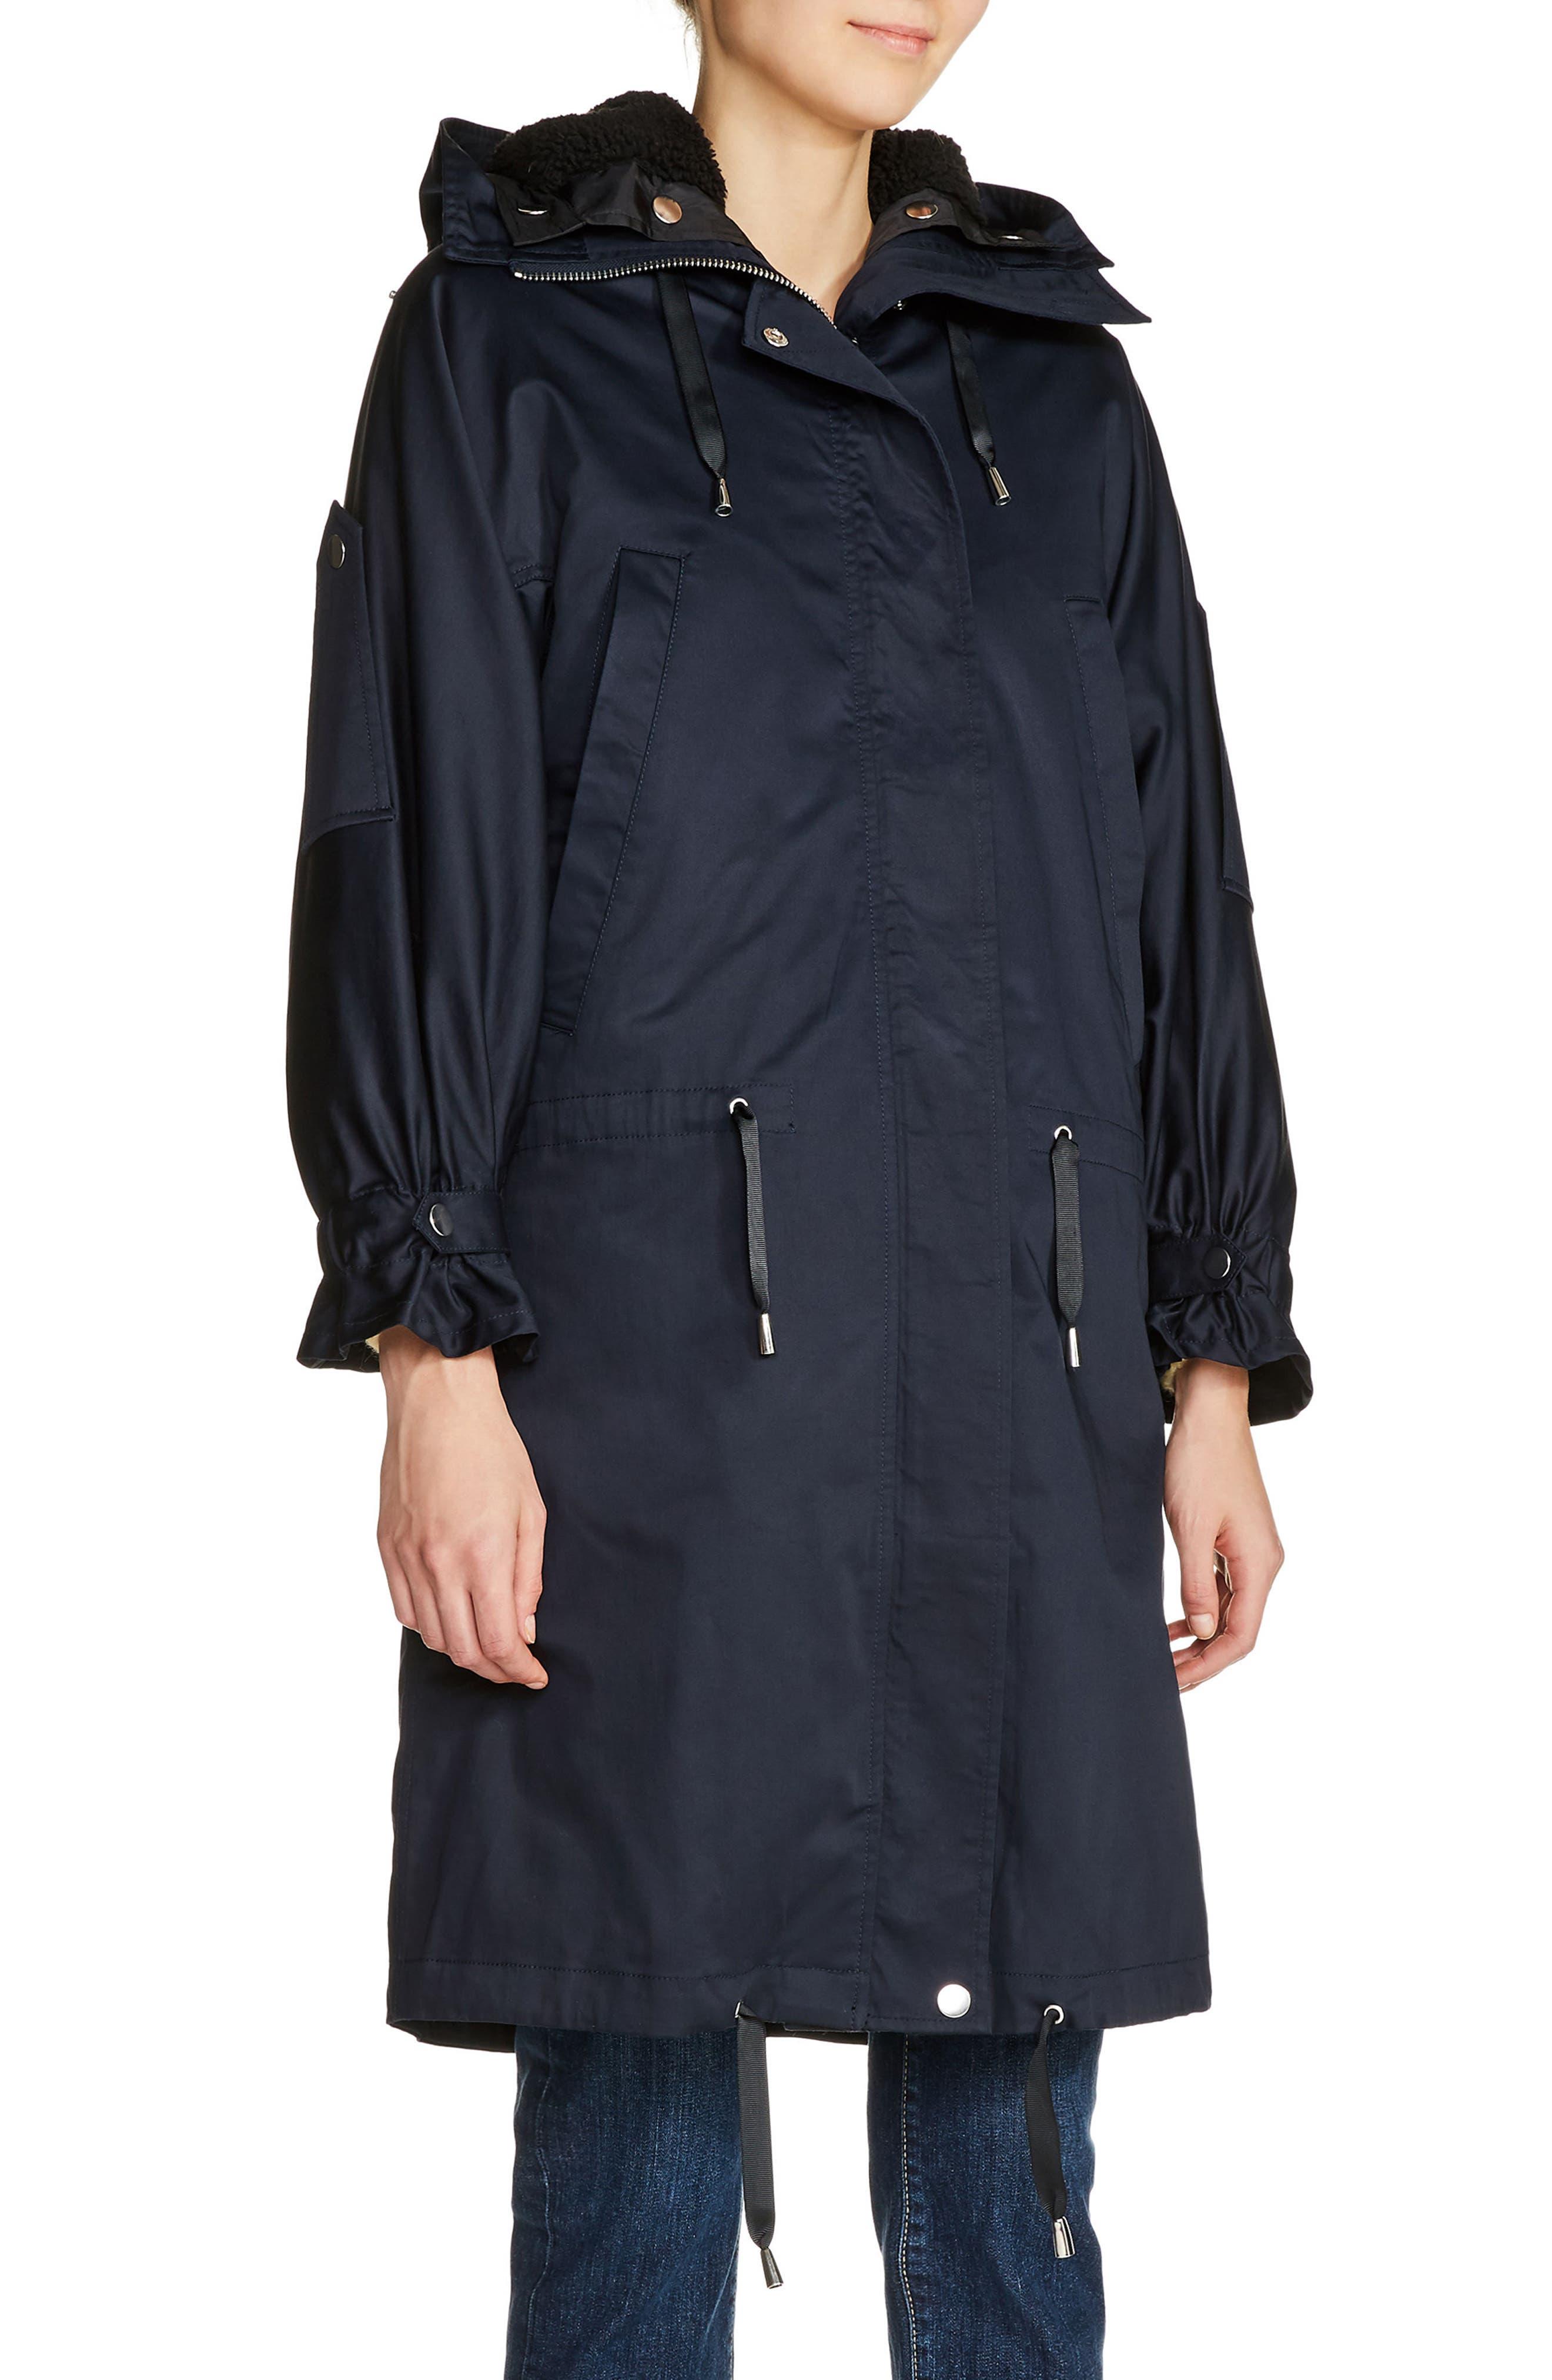 Faux Shearling Lined Long Raincoat,                         Main,                         color, Navy